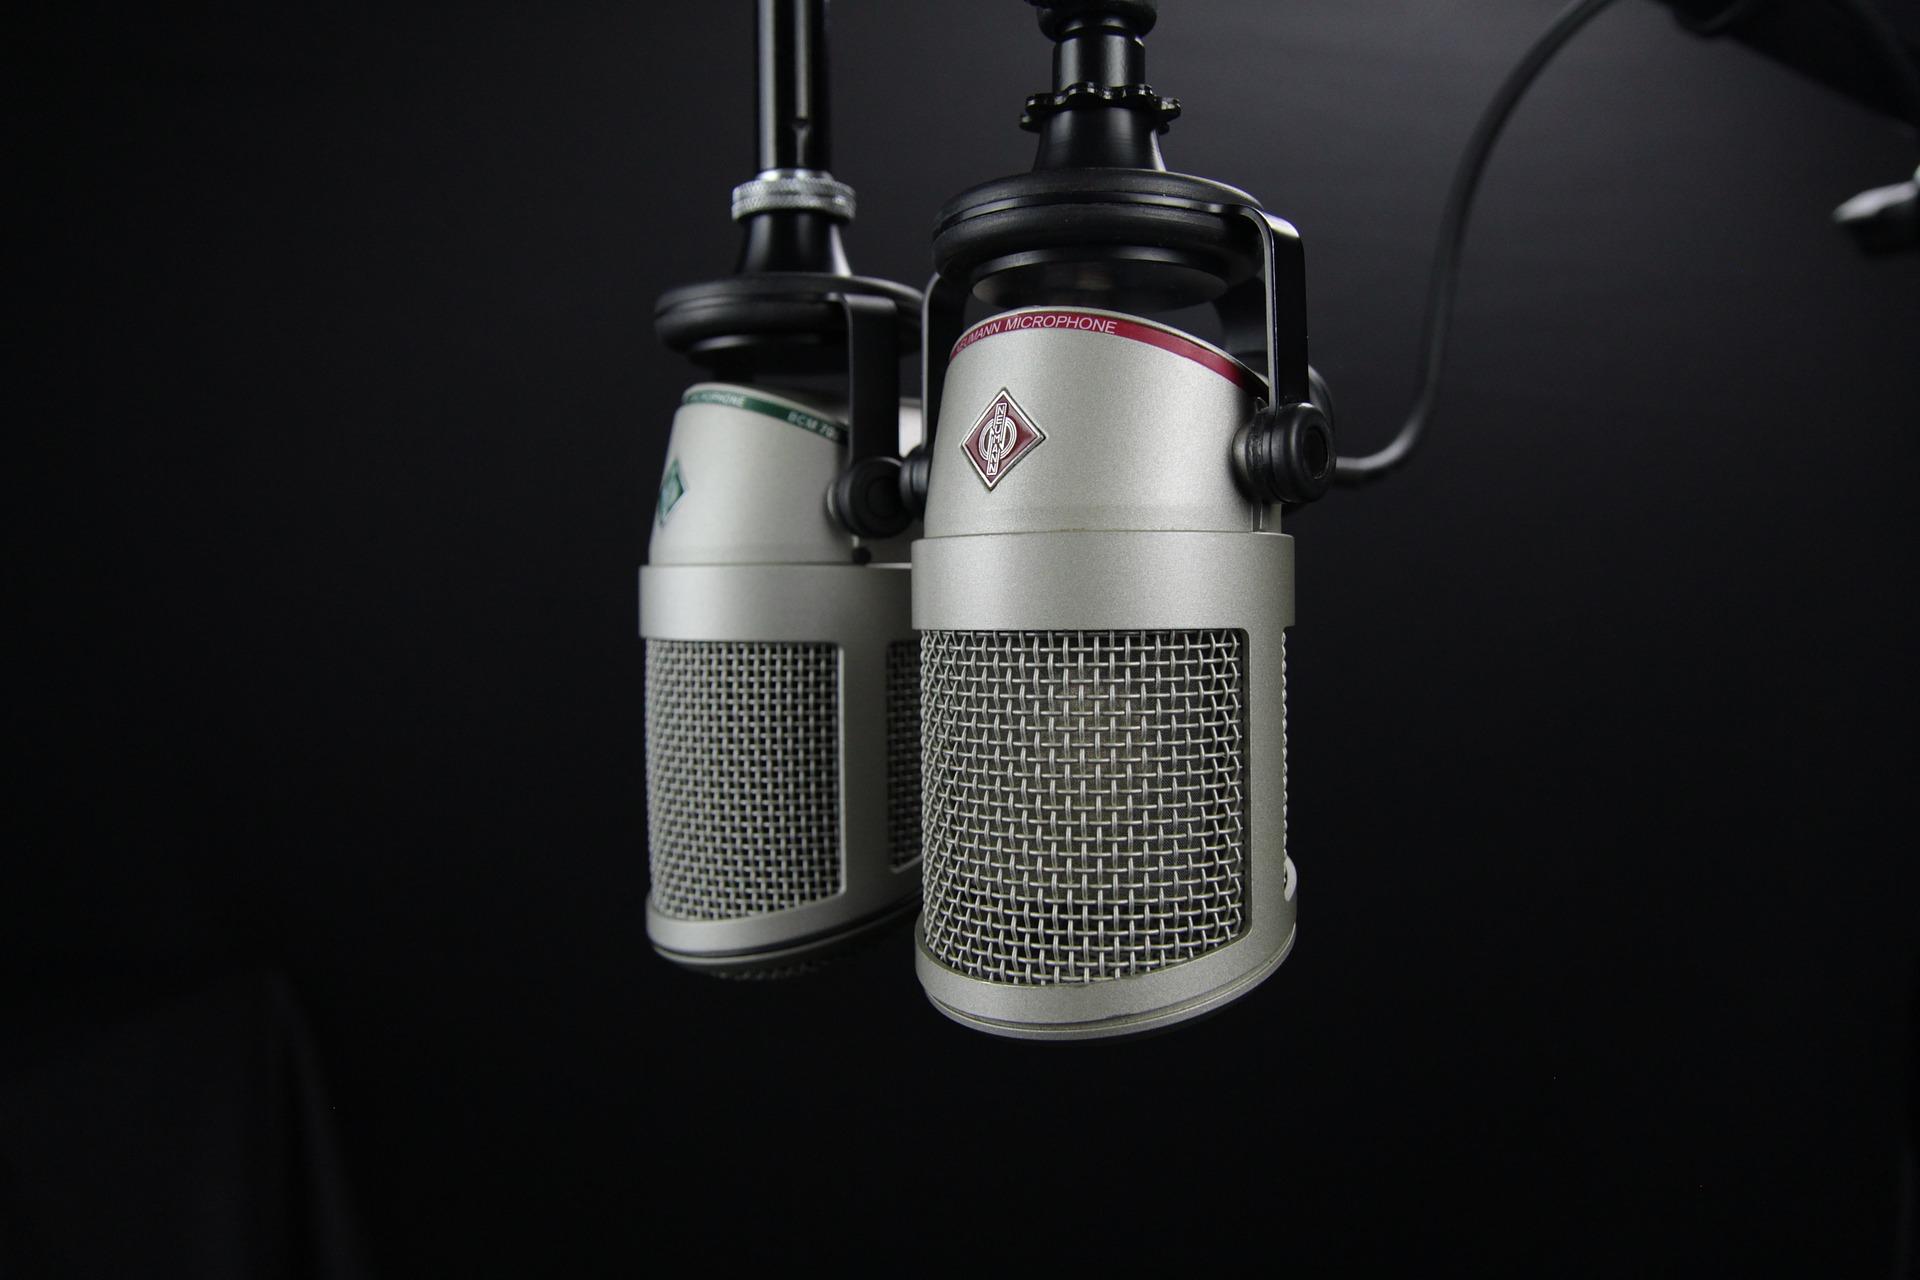 microphone-772577_1920.jpg